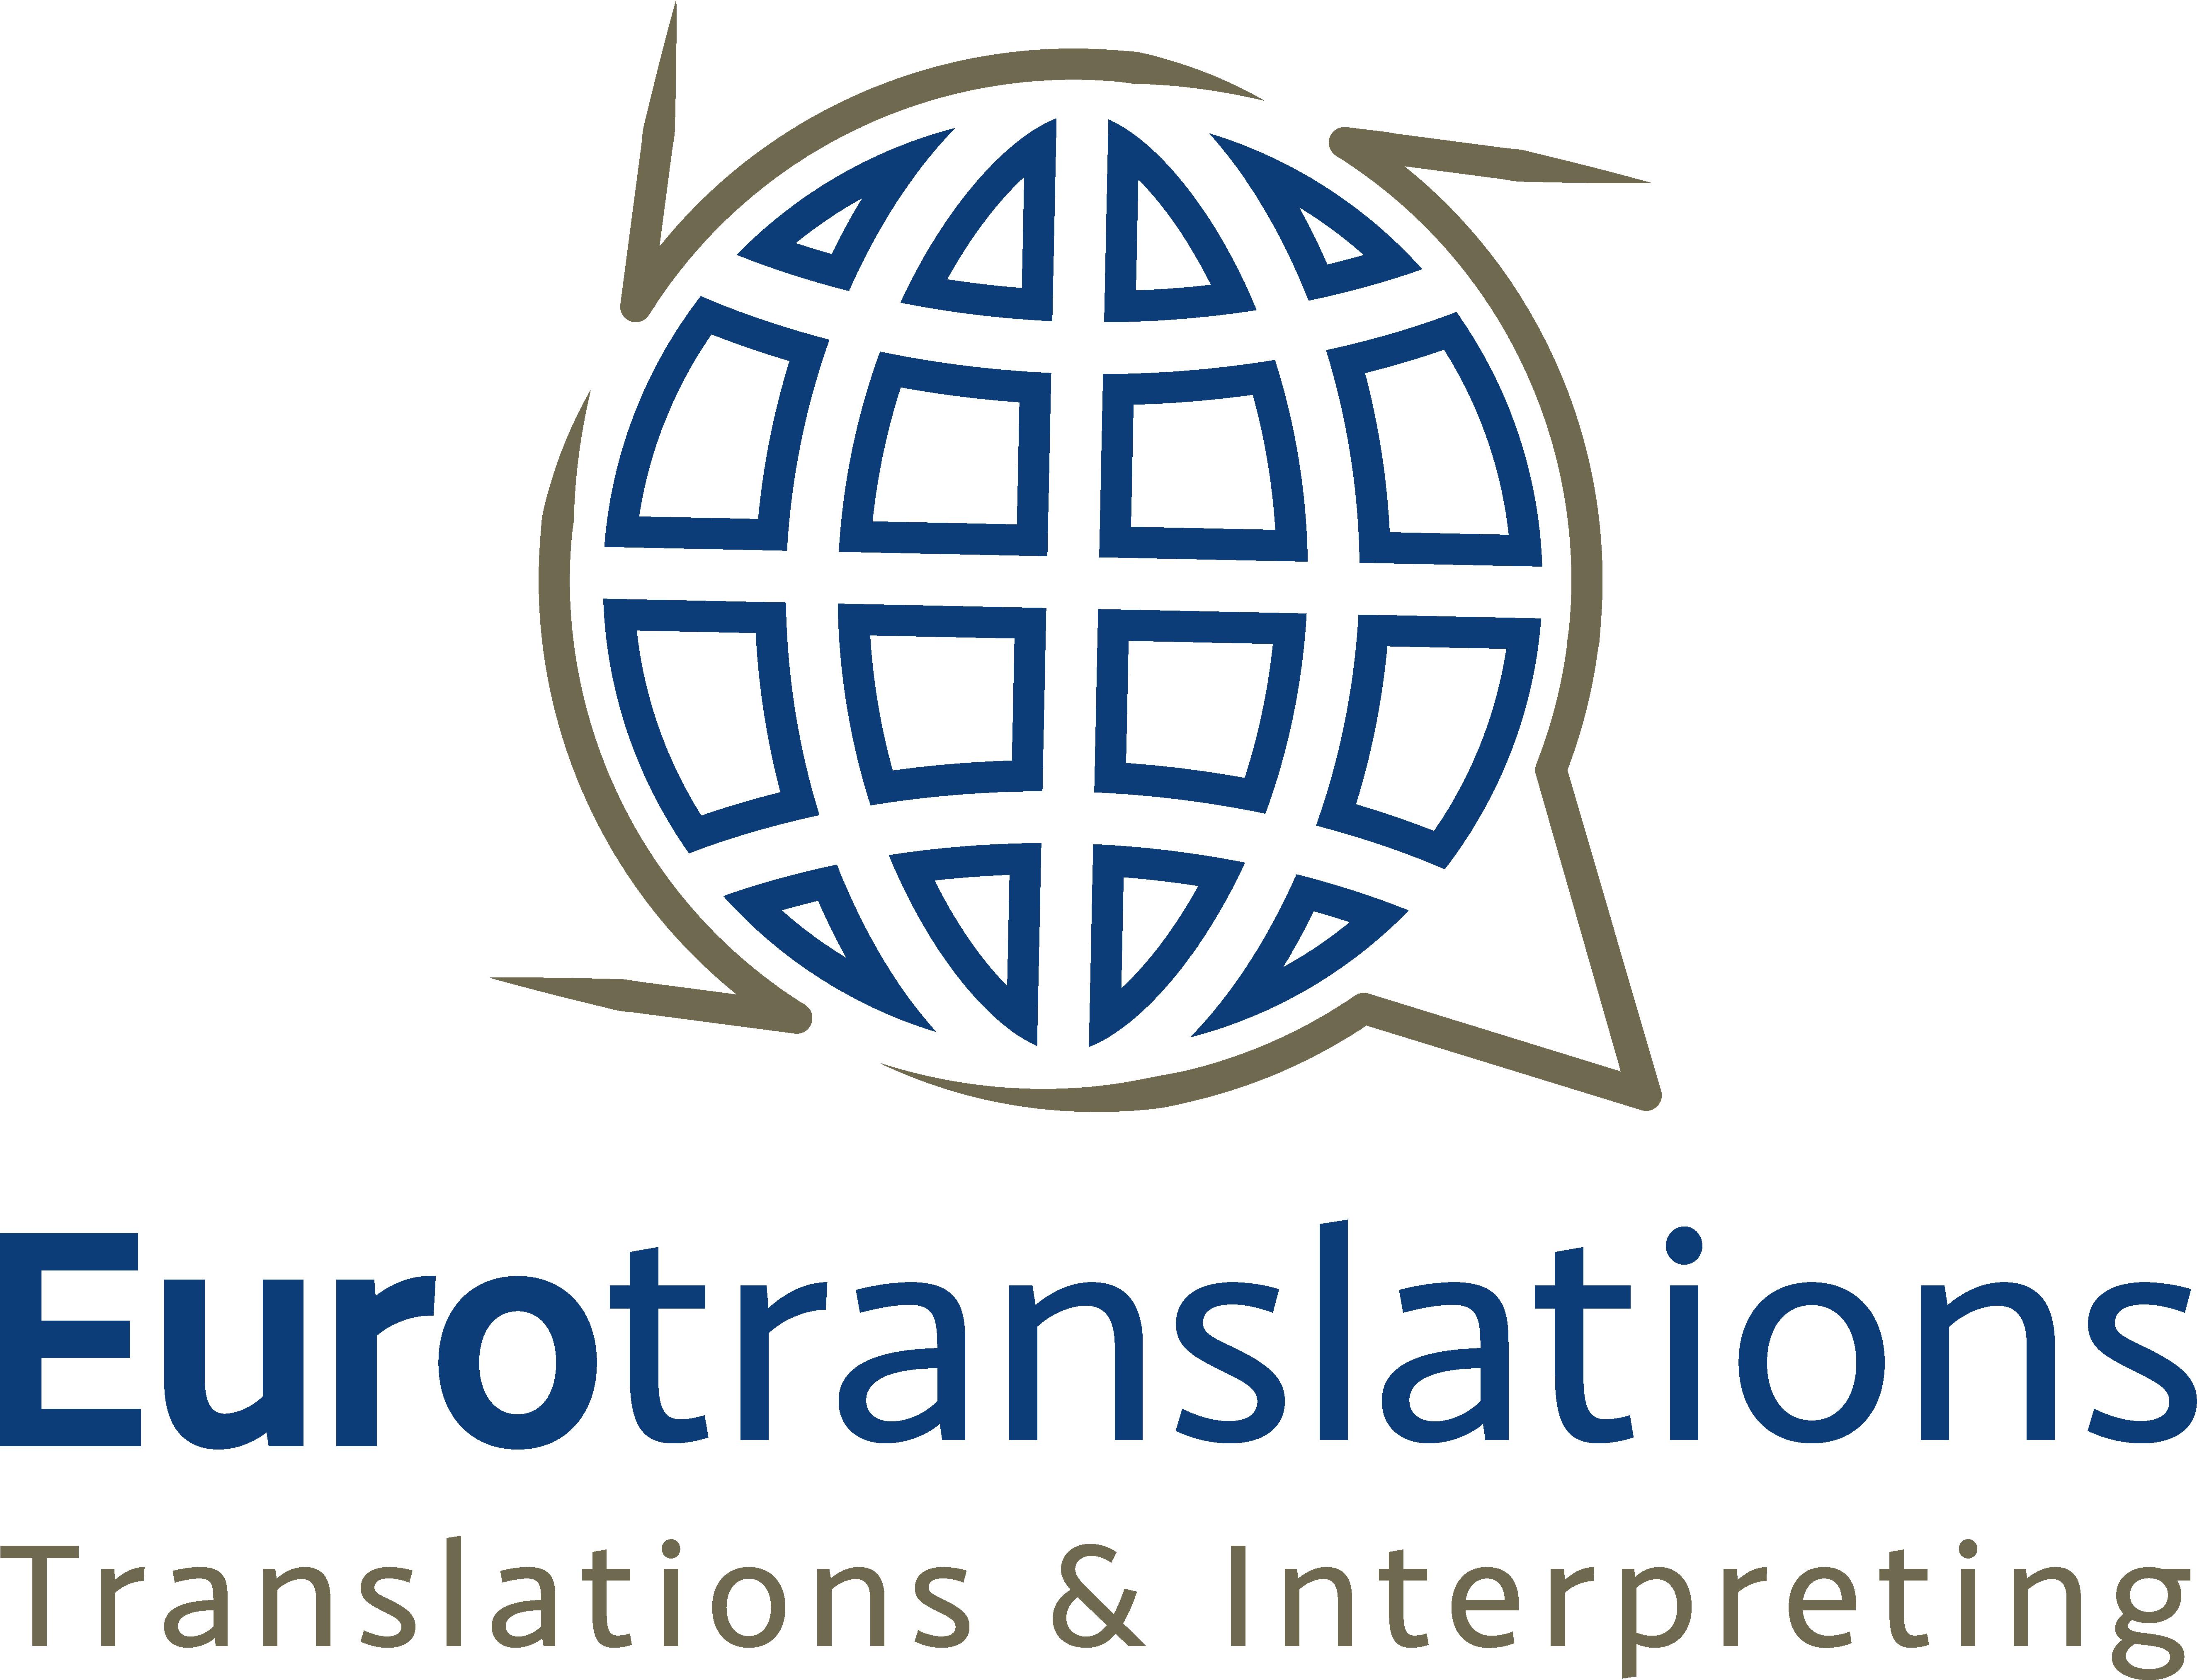 Eurotranslations